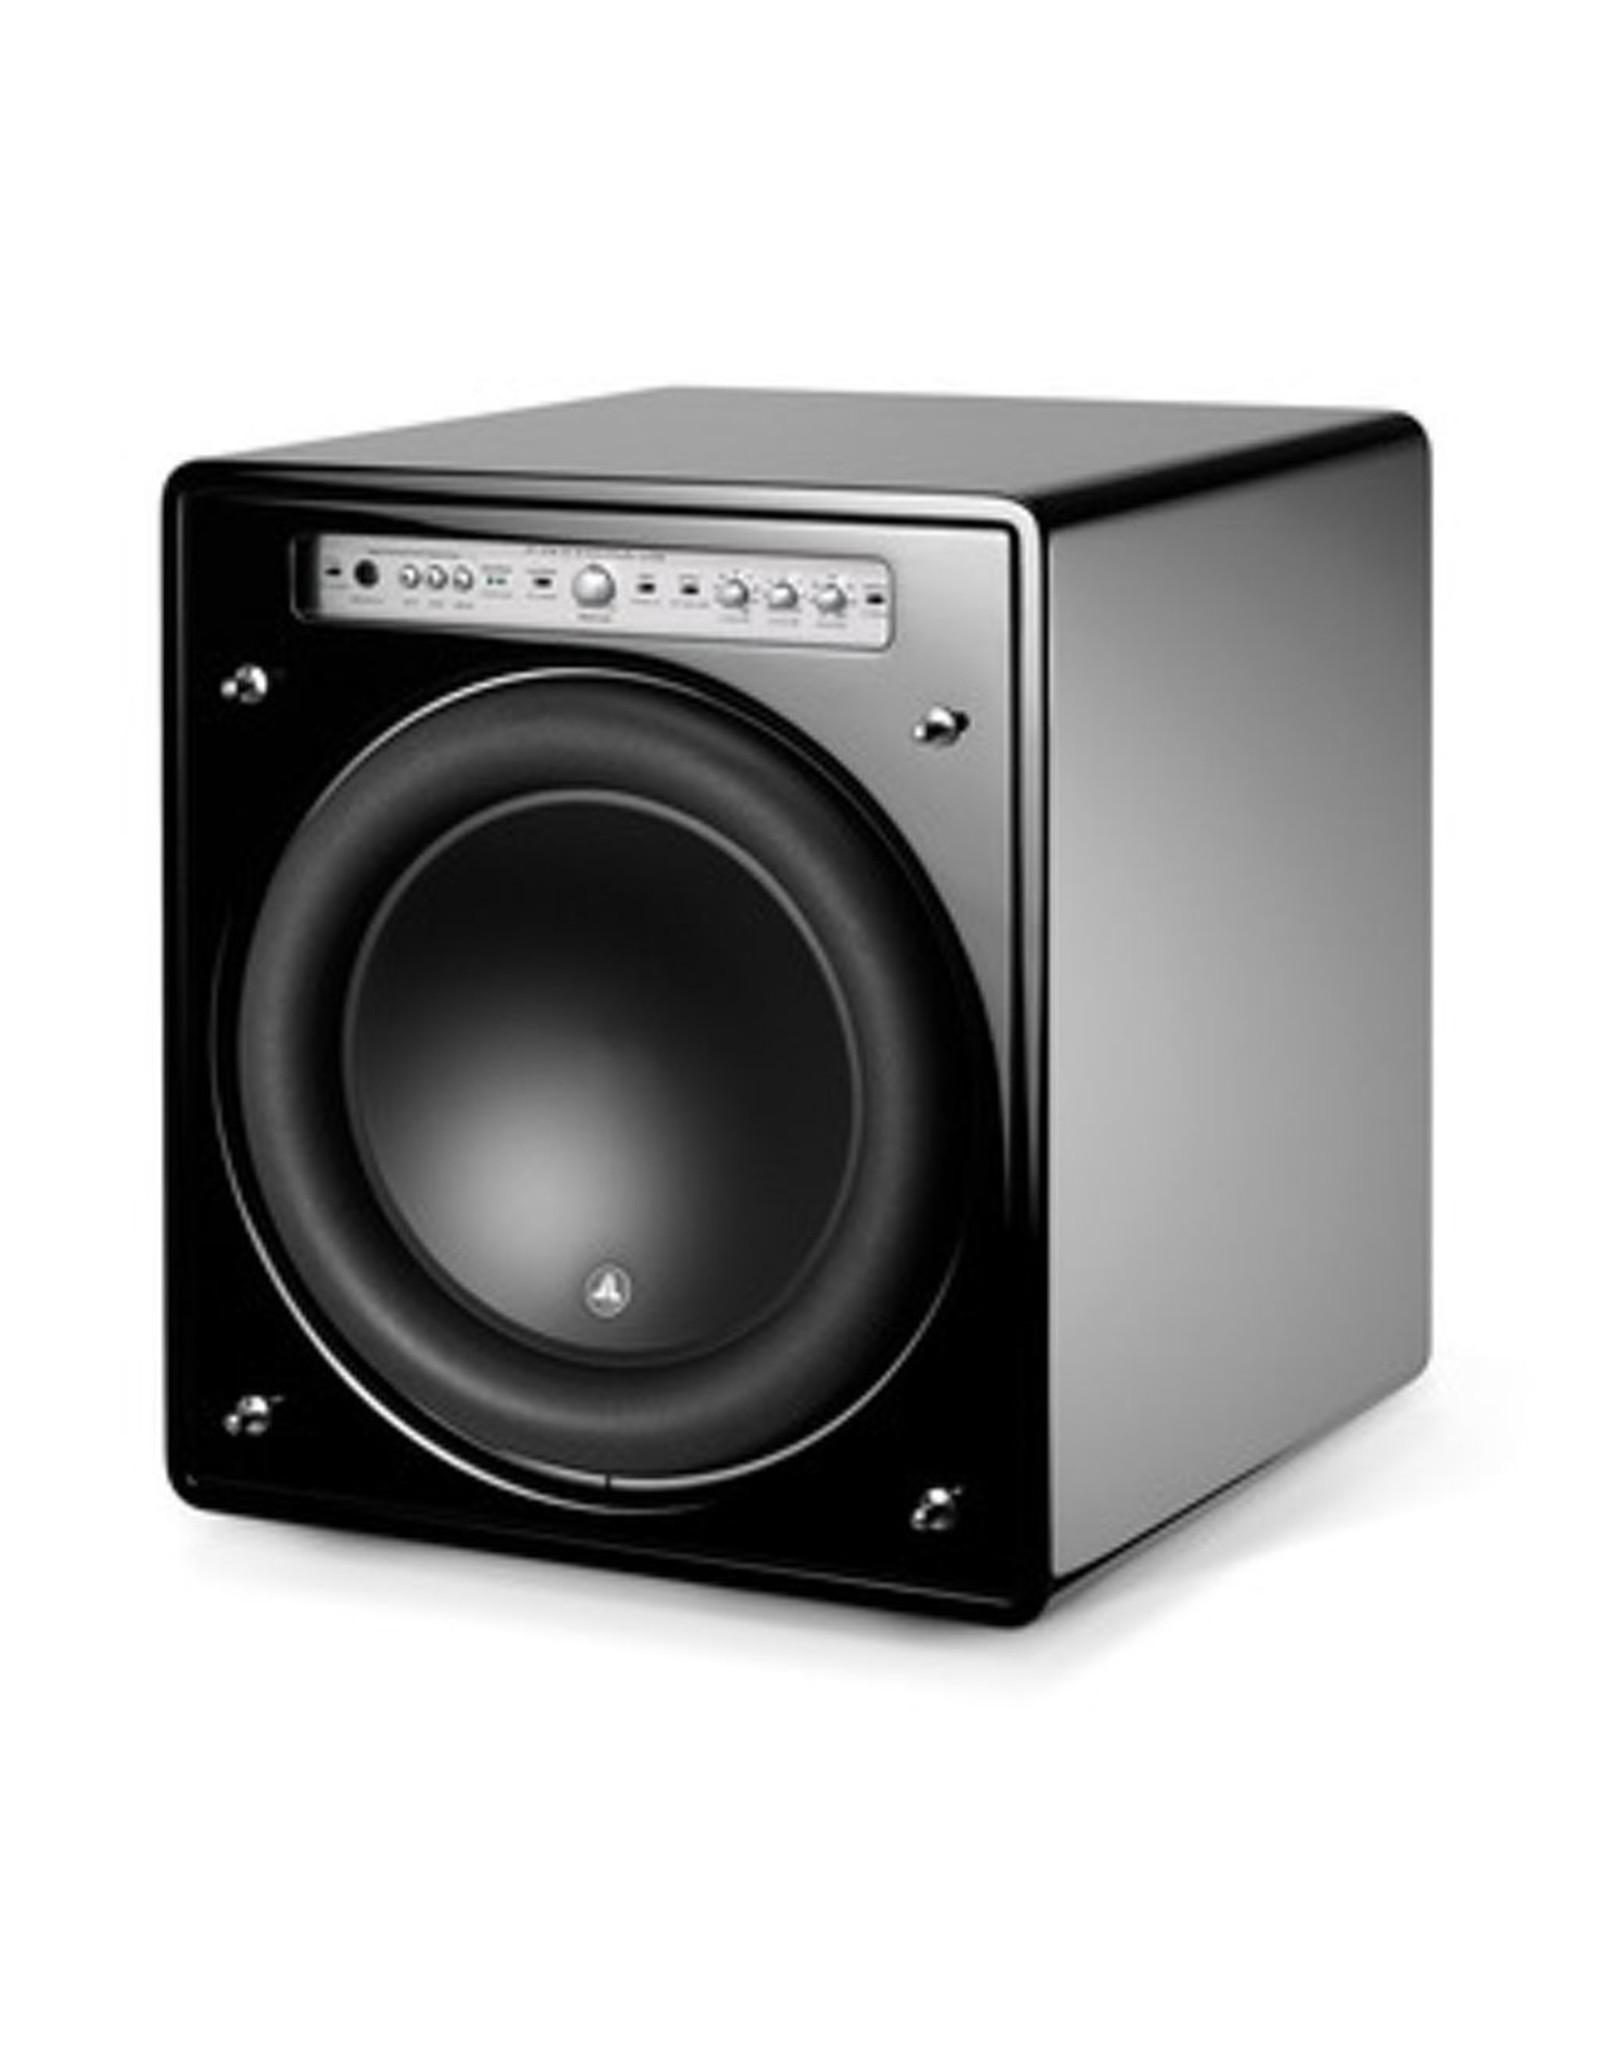 "JL AUDIO JL AUDIO f113v2 13.5"" Fathom 2.5kW Subwoofer, GLOSS BLACK"